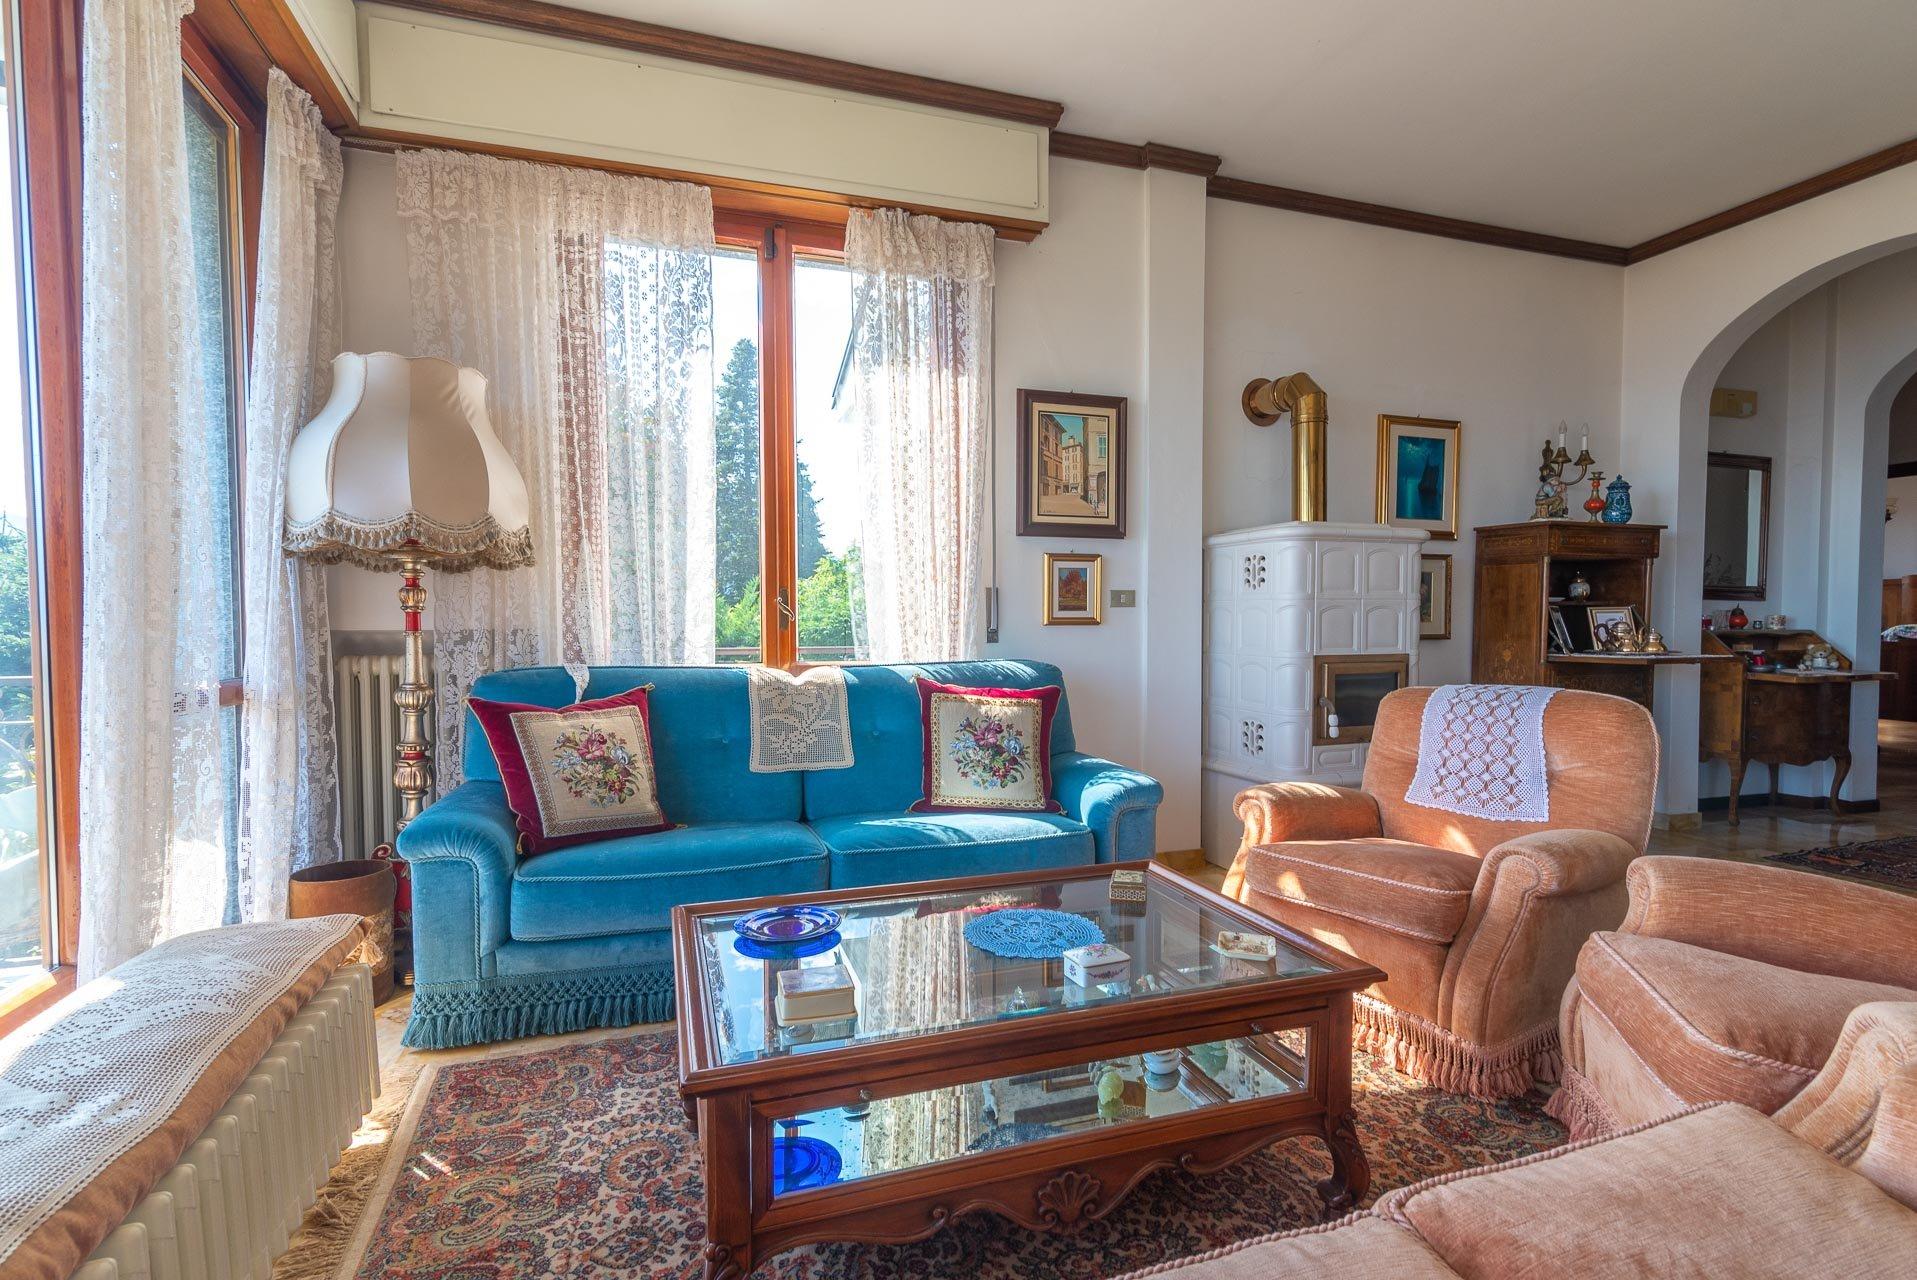 Villa with garden for sale in Verbania